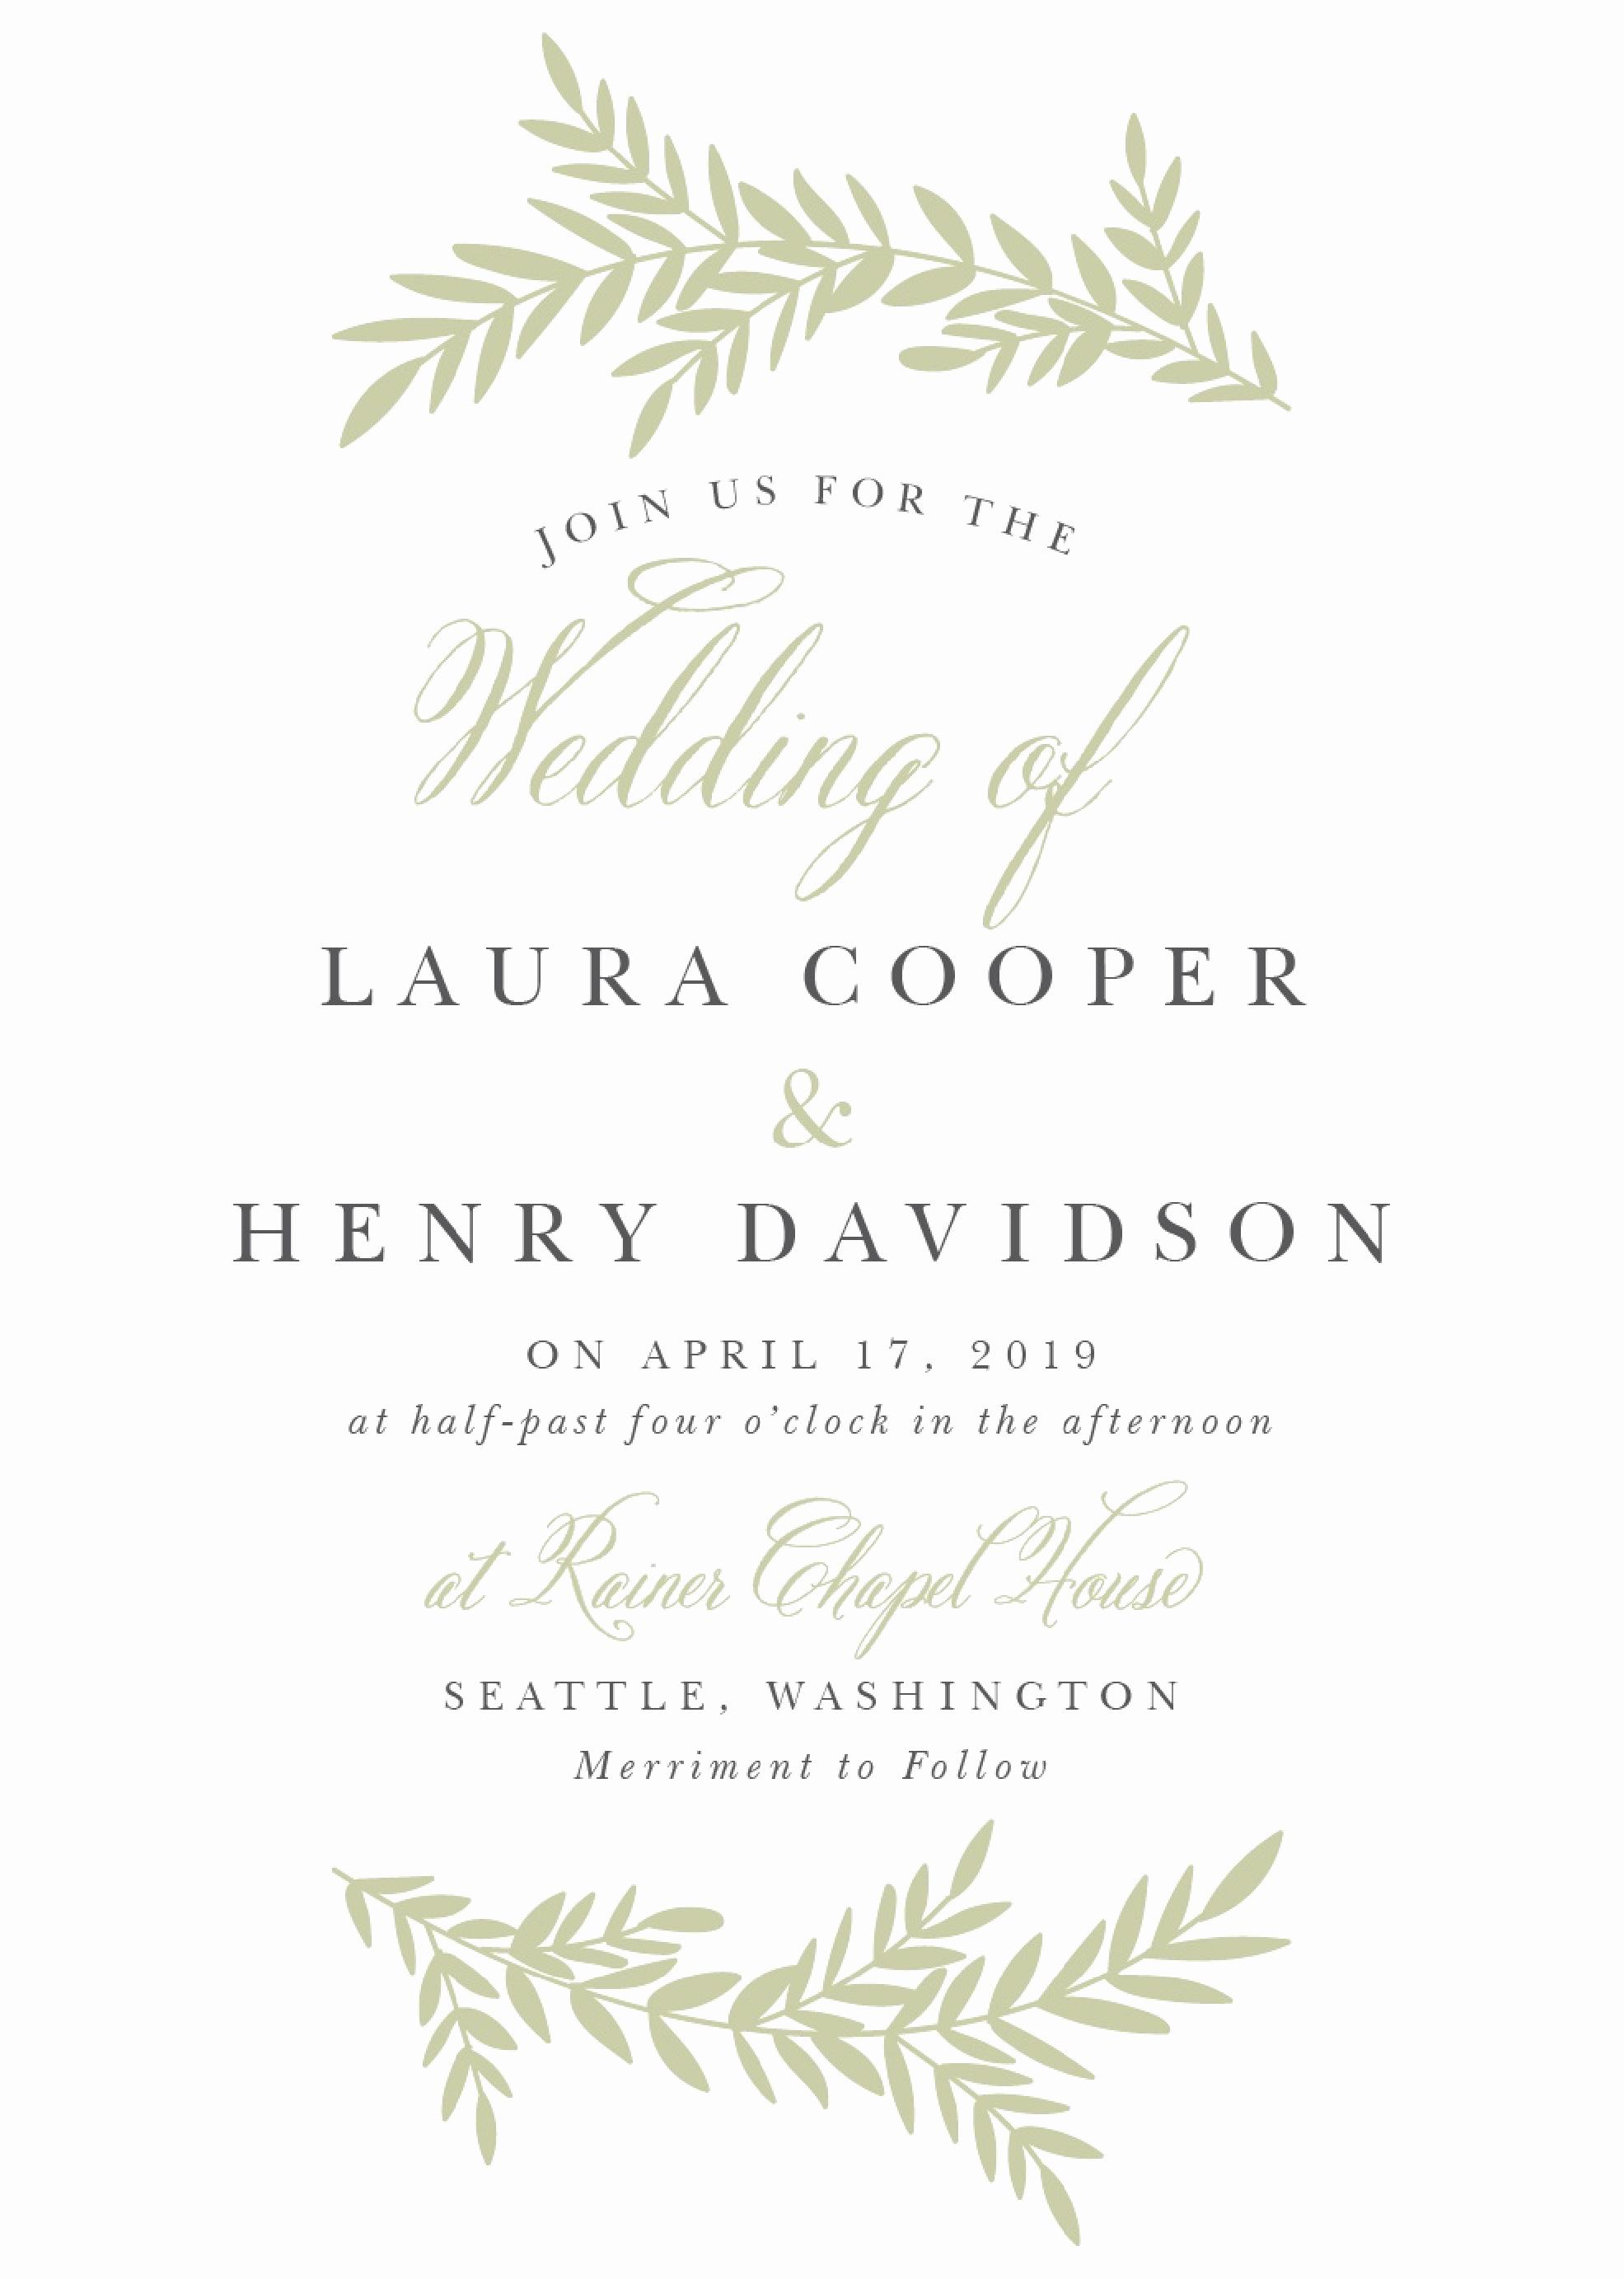 Sample Wedding Invitation Wording Fresh Wedding Invitation Wording Samples